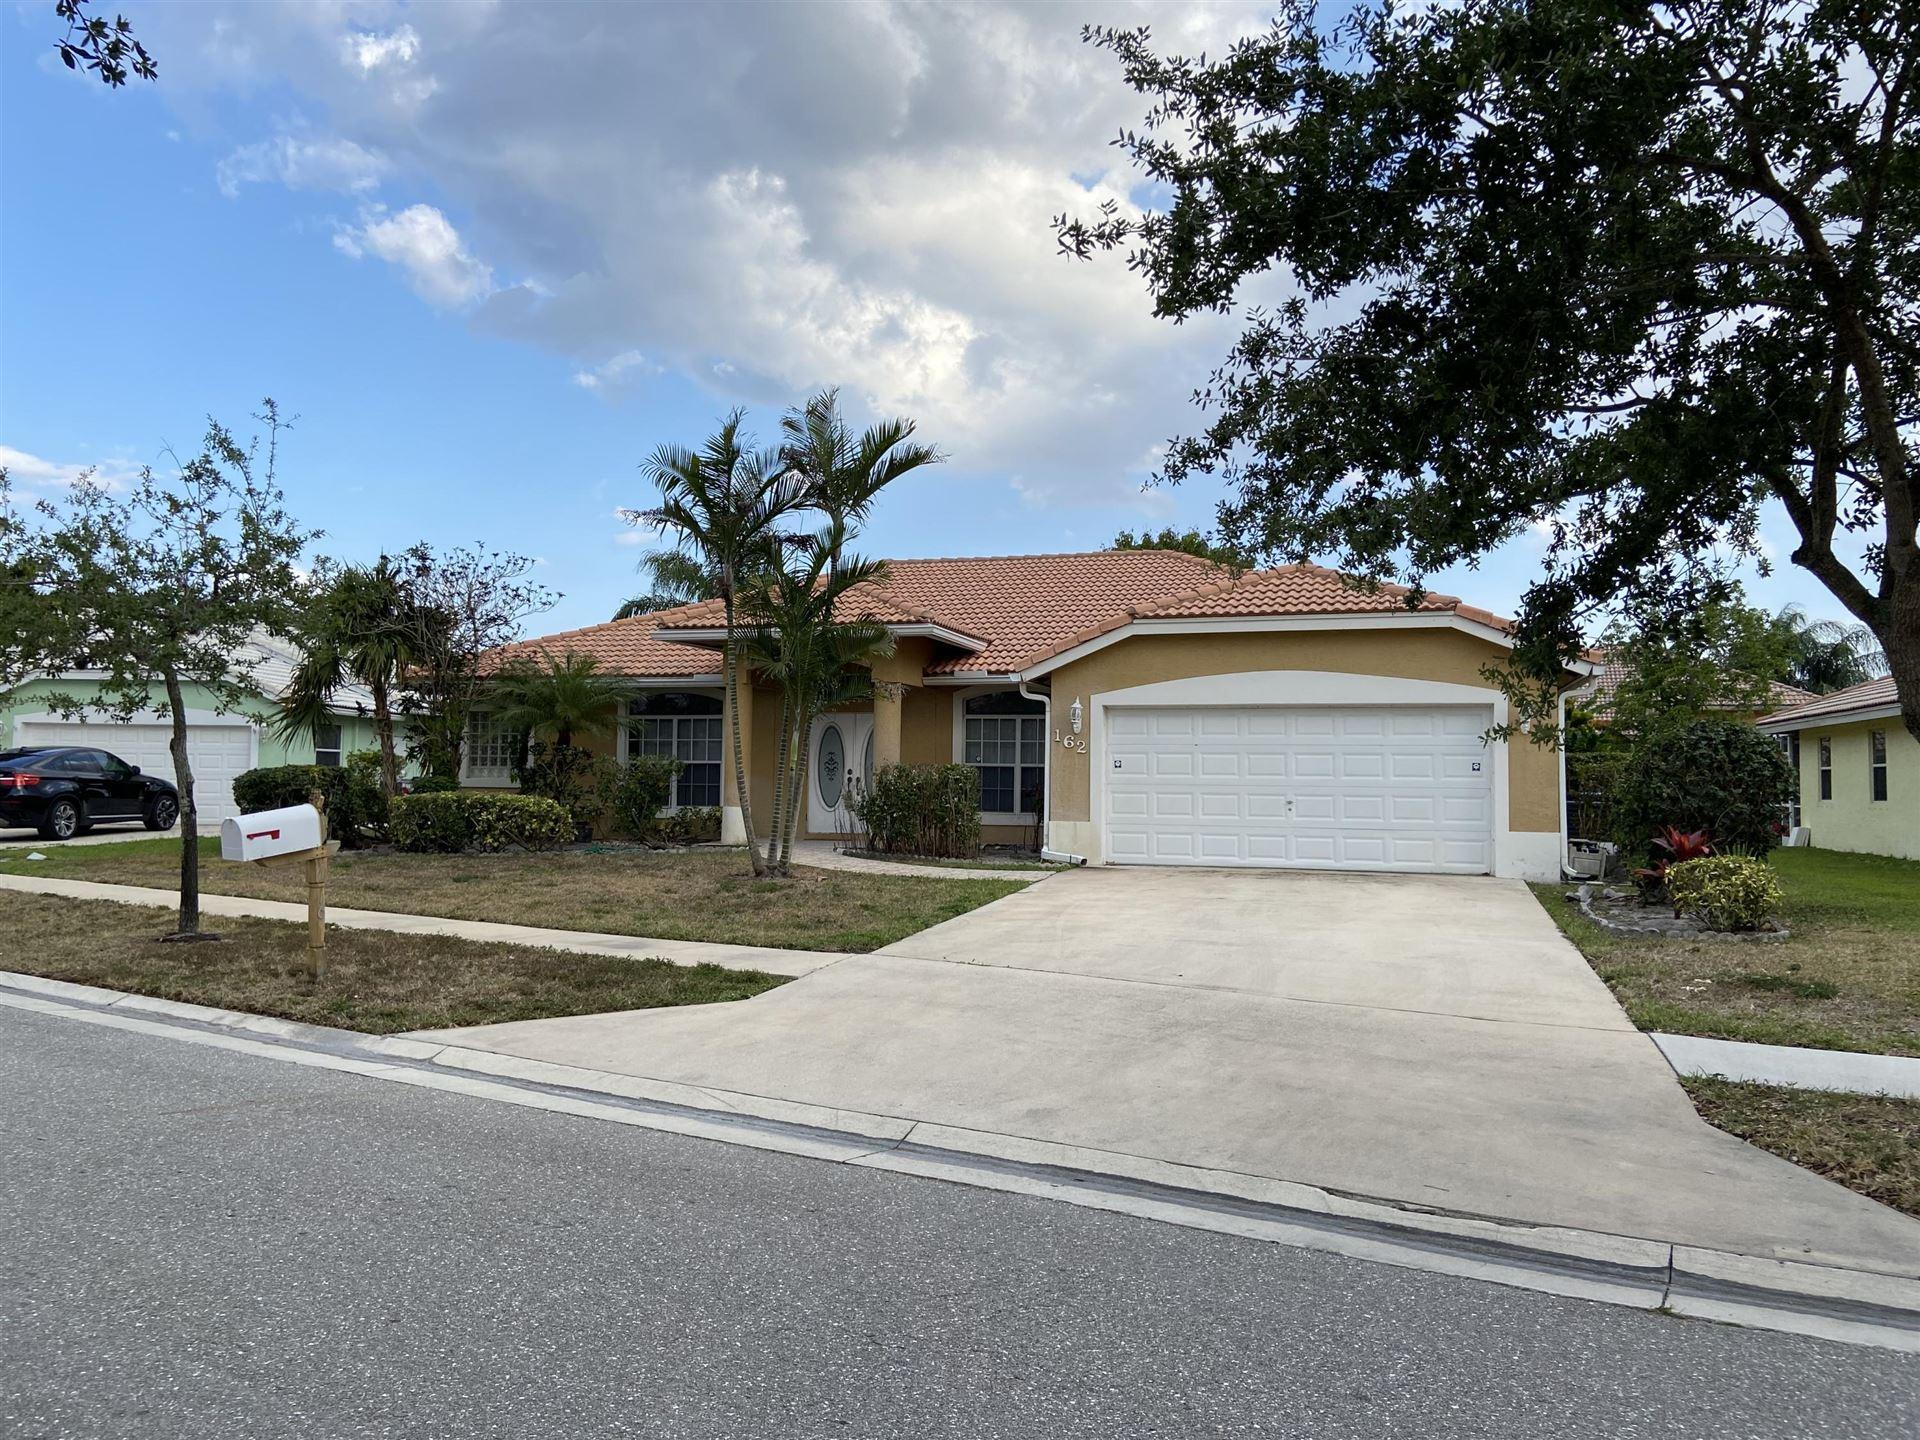 162 Fernwood Crescent, Royal Palm Beach, FL 33411 - #: RX-10706733